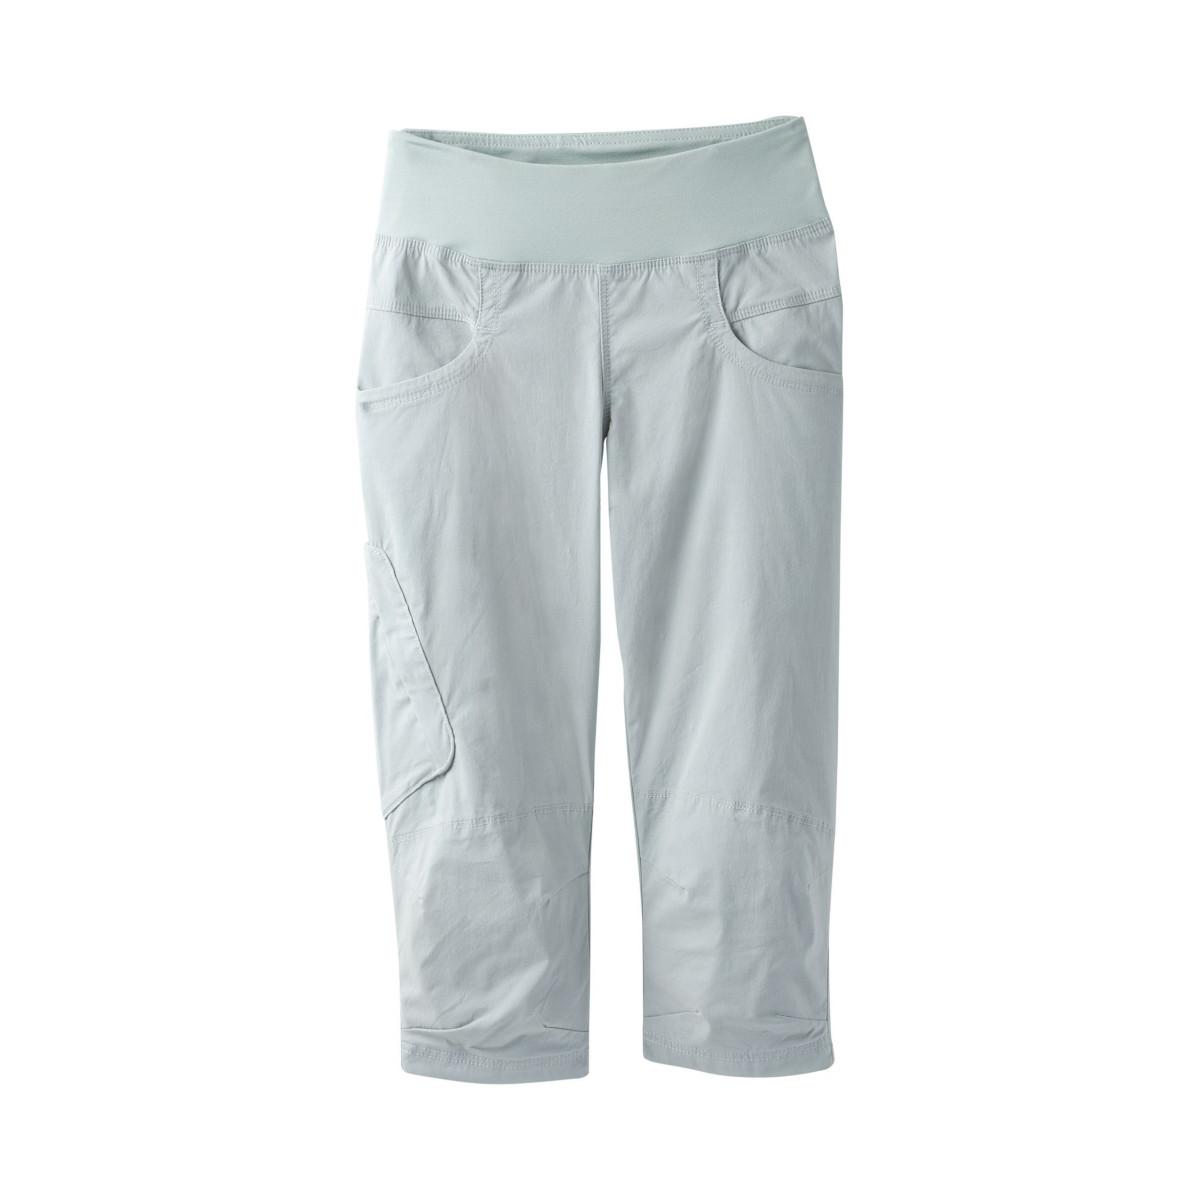 Charko Designs Womens Arak Athletic Shorts